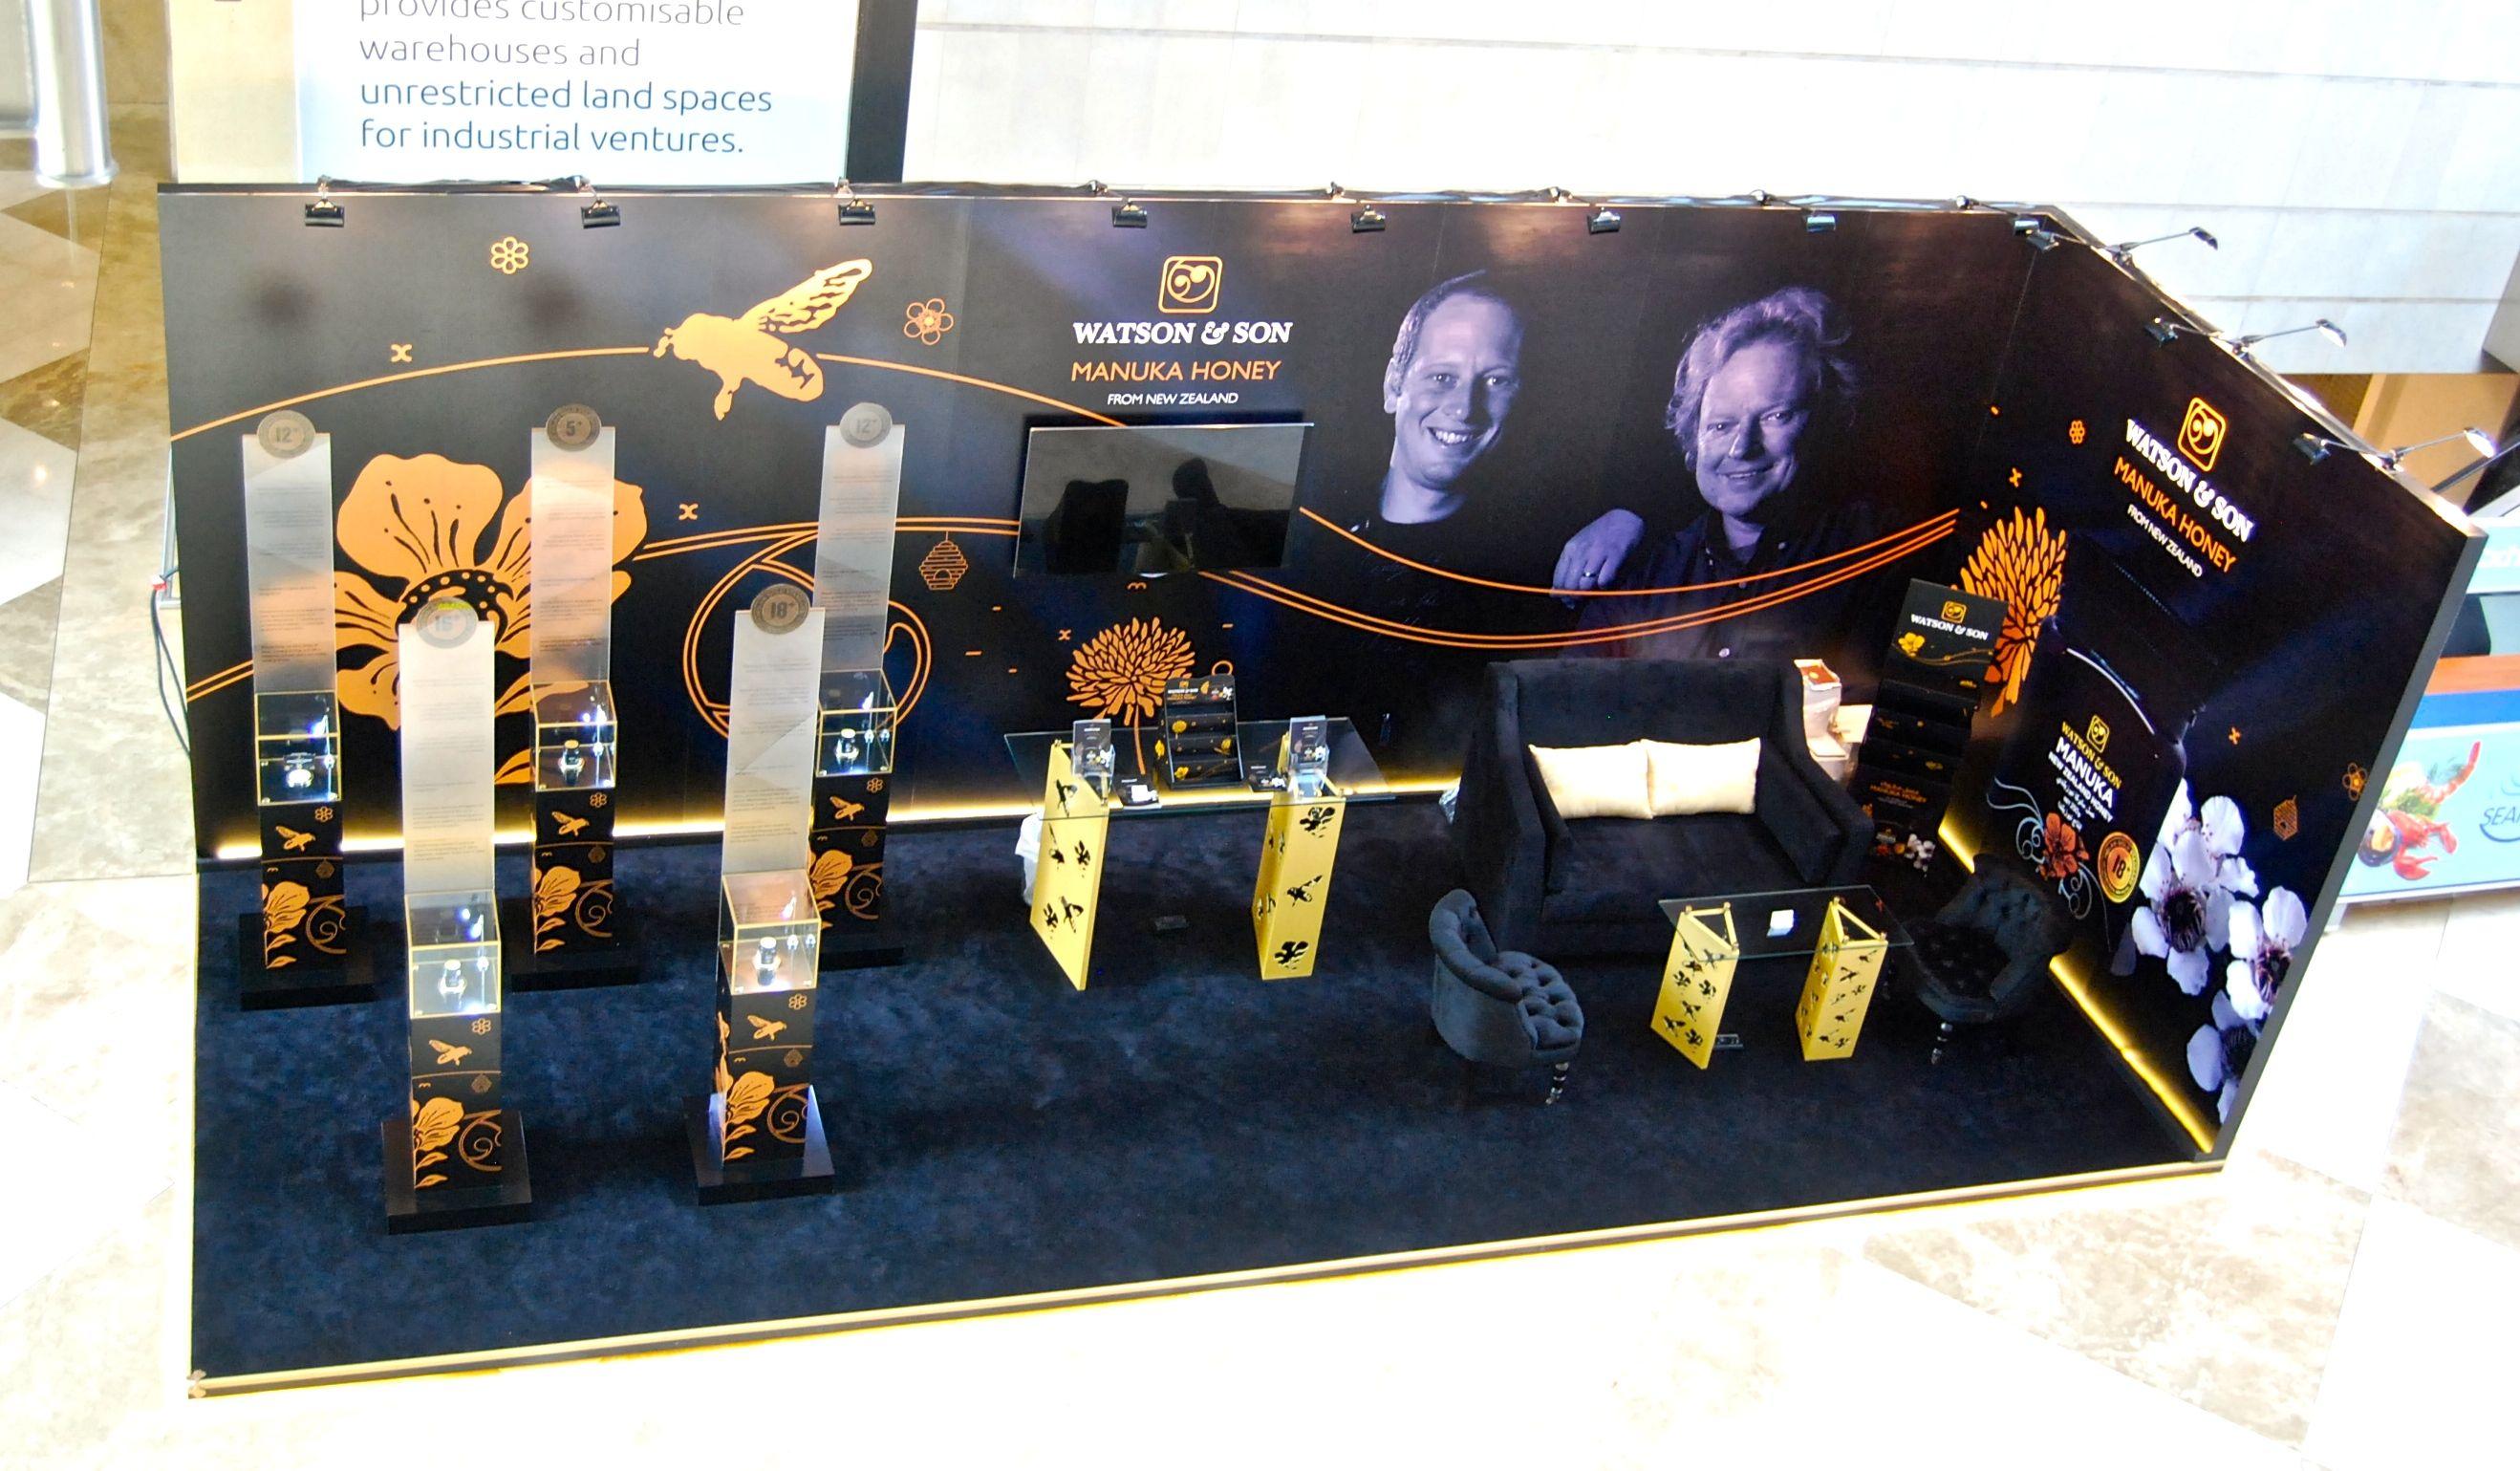 Shimco Returns to the Japan International Aerospace Exhibition